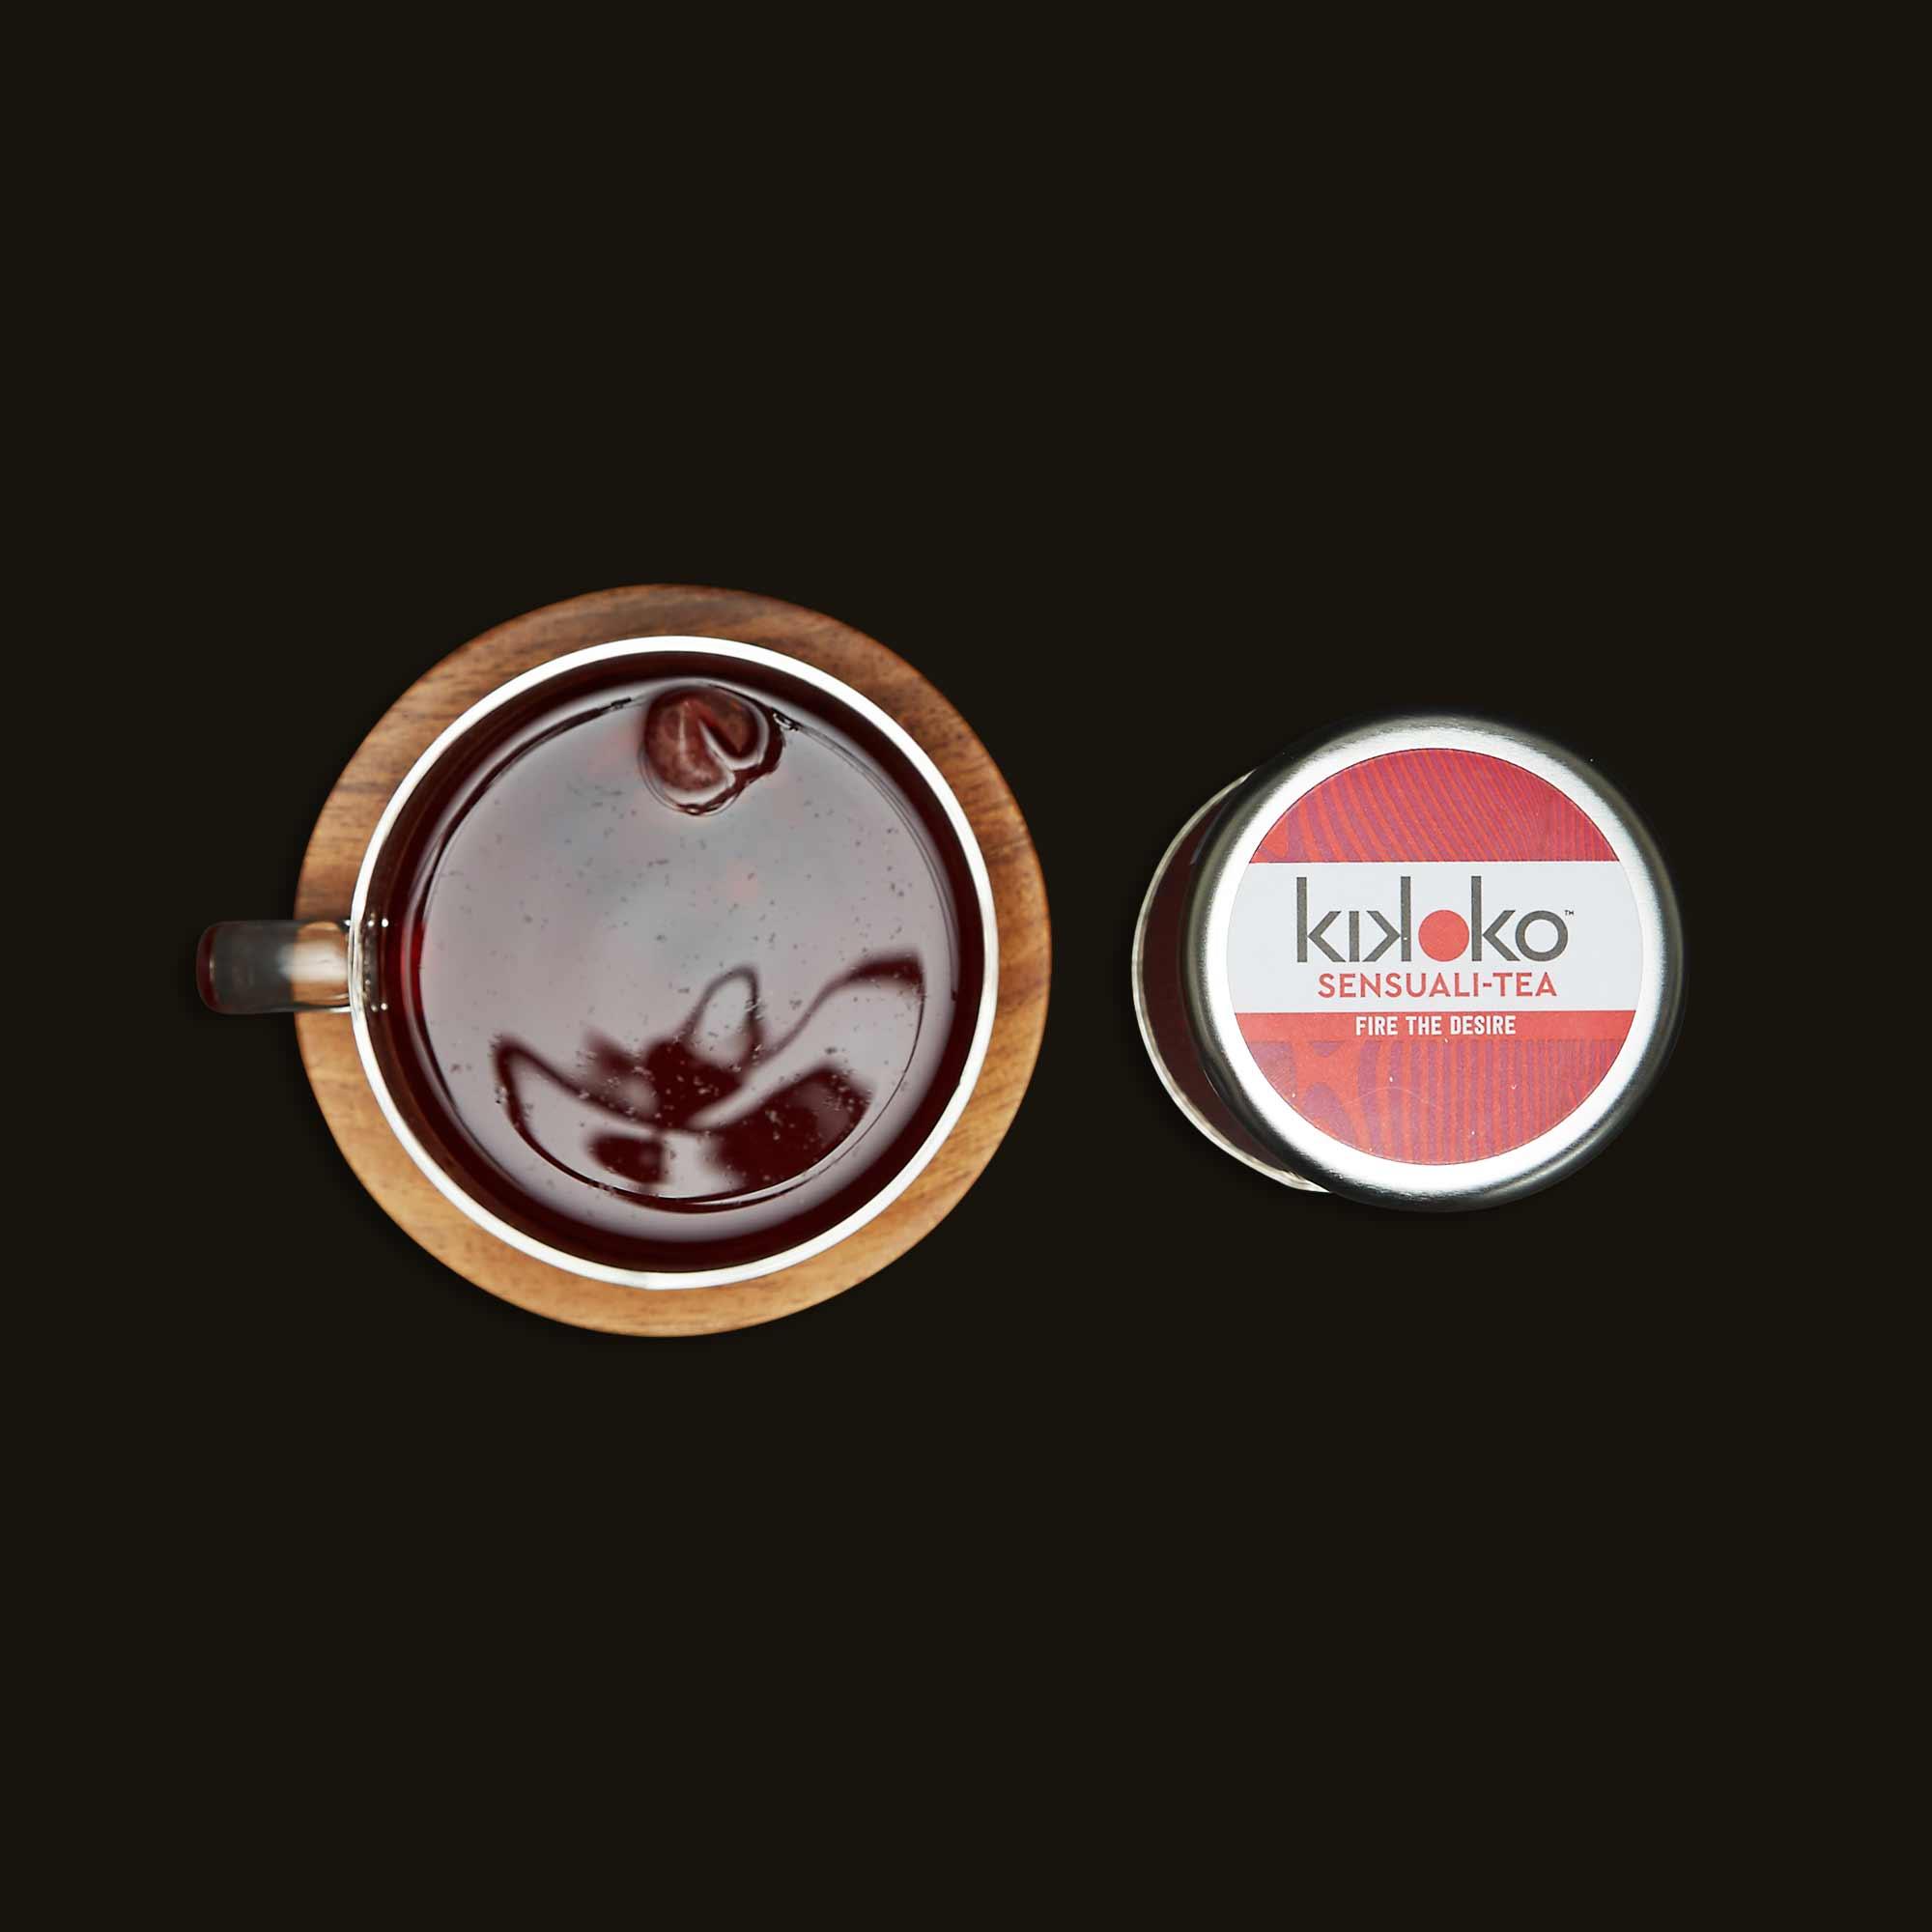 Coffee & Tea Beverage by kikoko